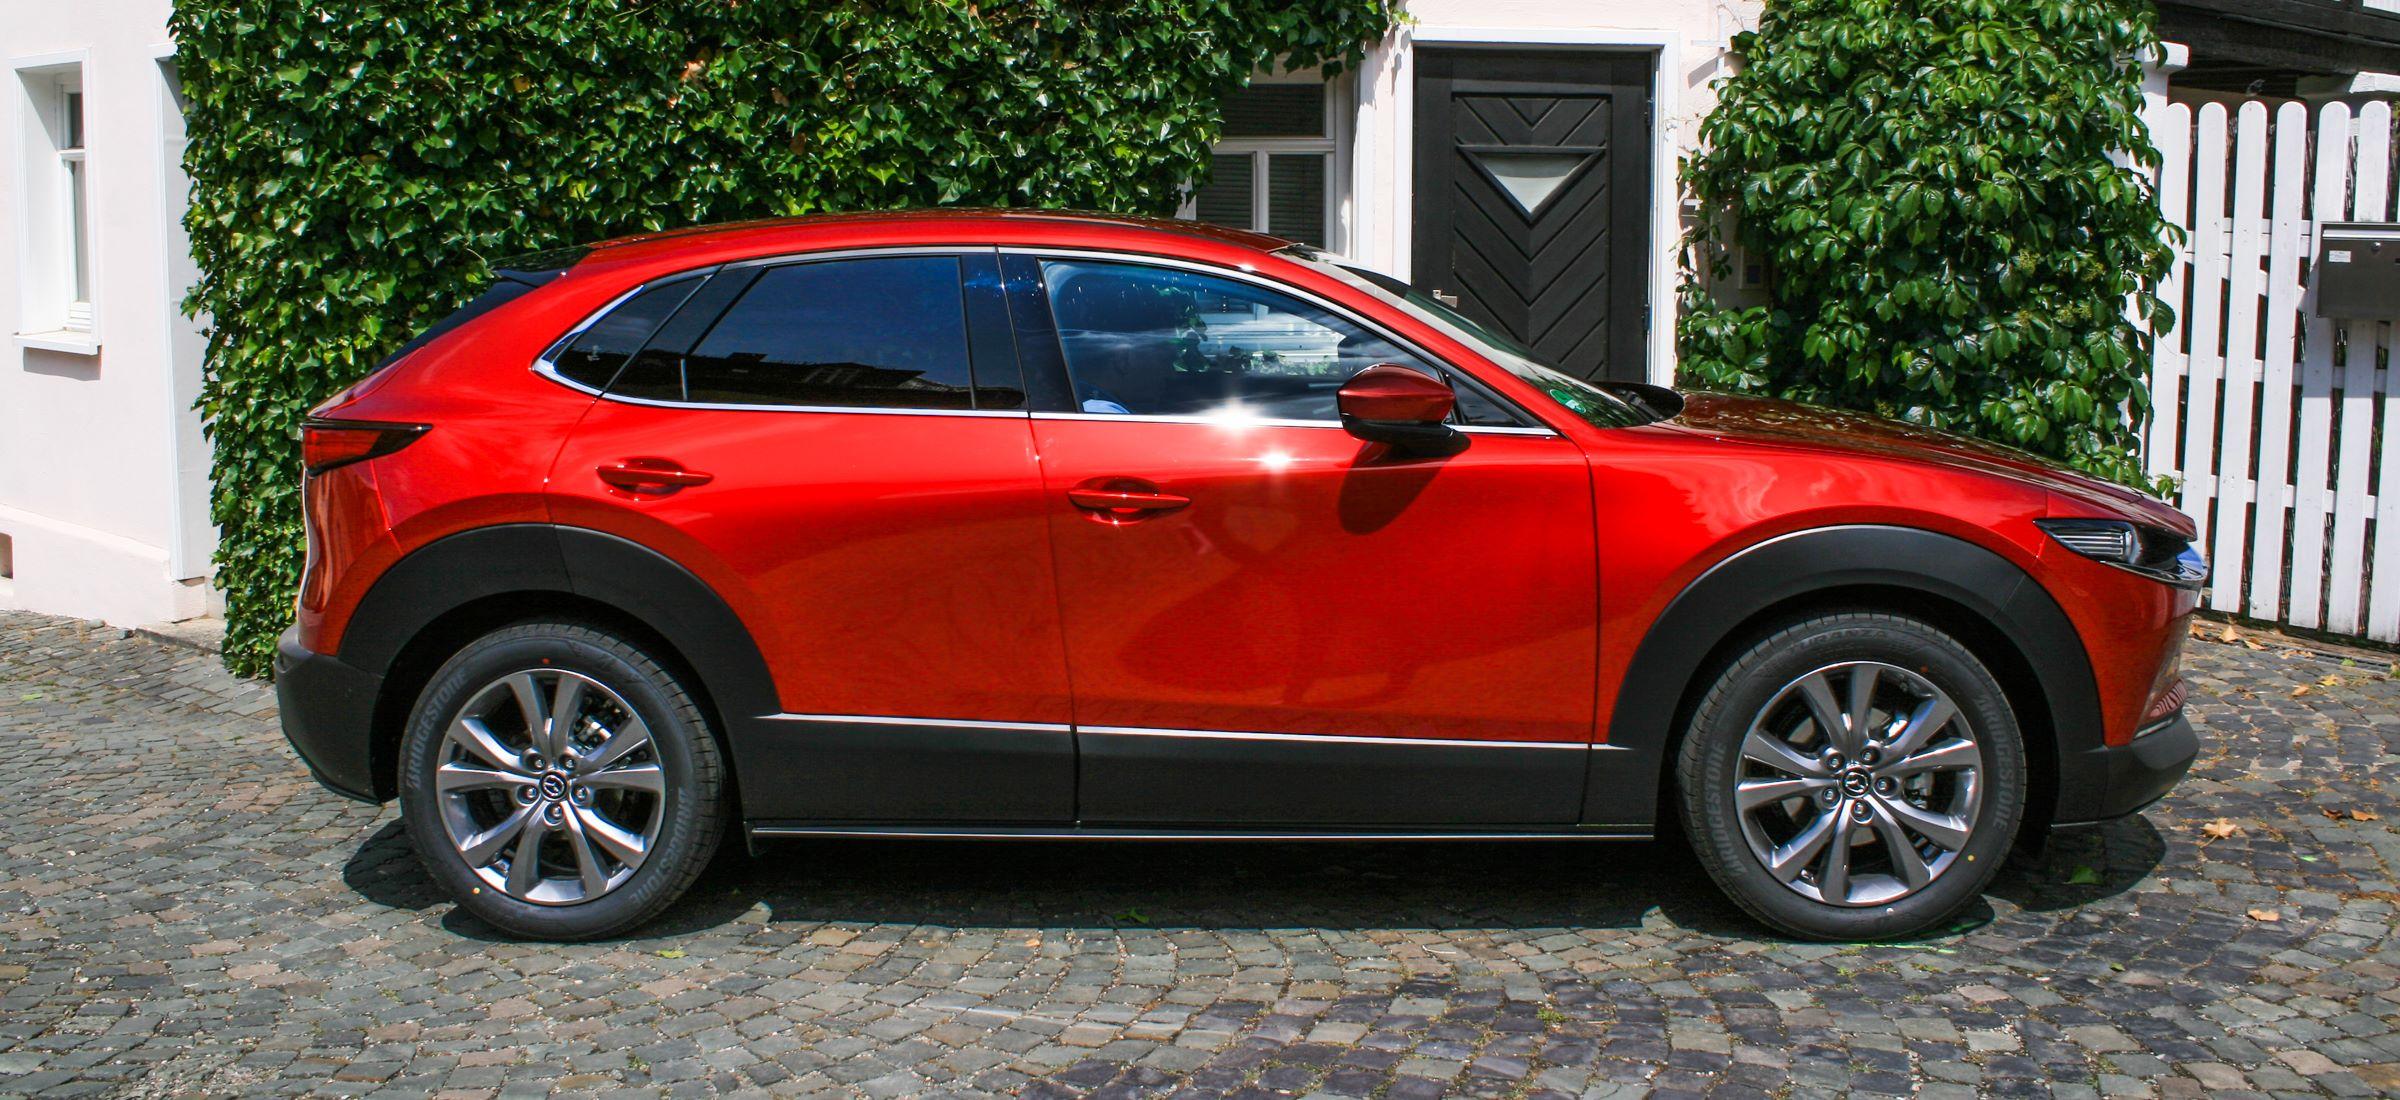 Mazda CX-30 test 2019